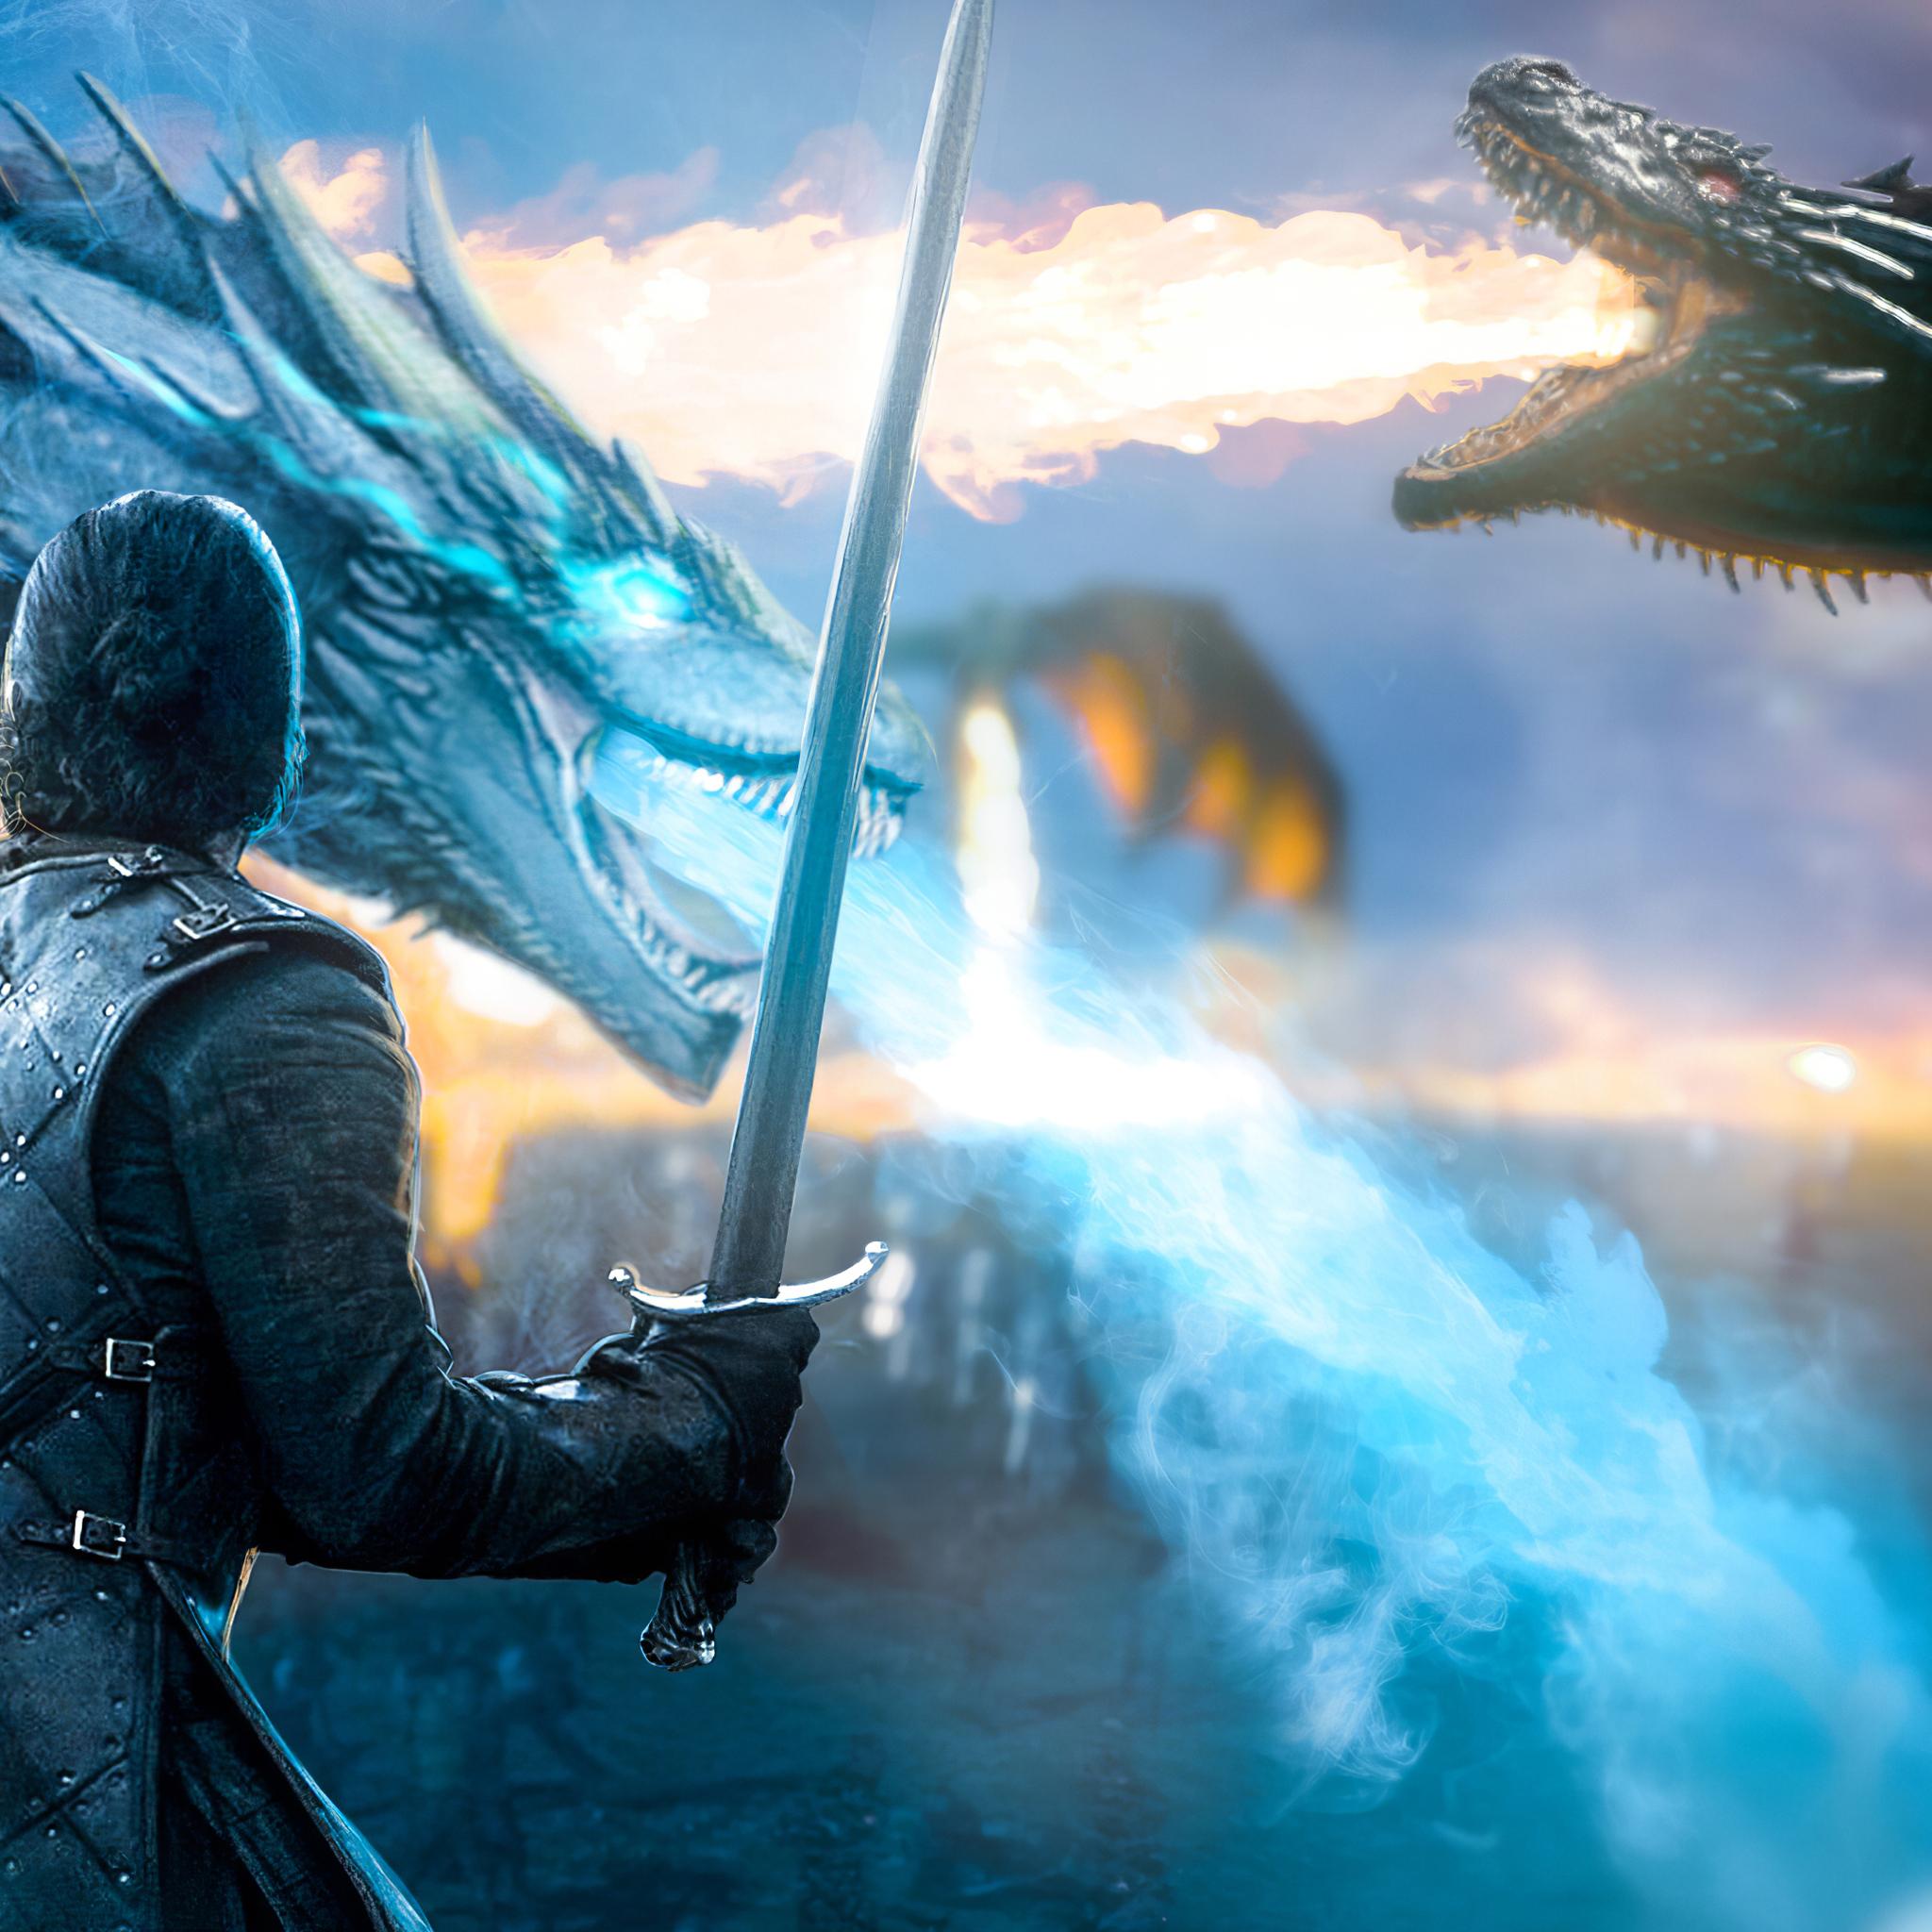 jon-snow-game-of-thrones-dragon-d4.jpg